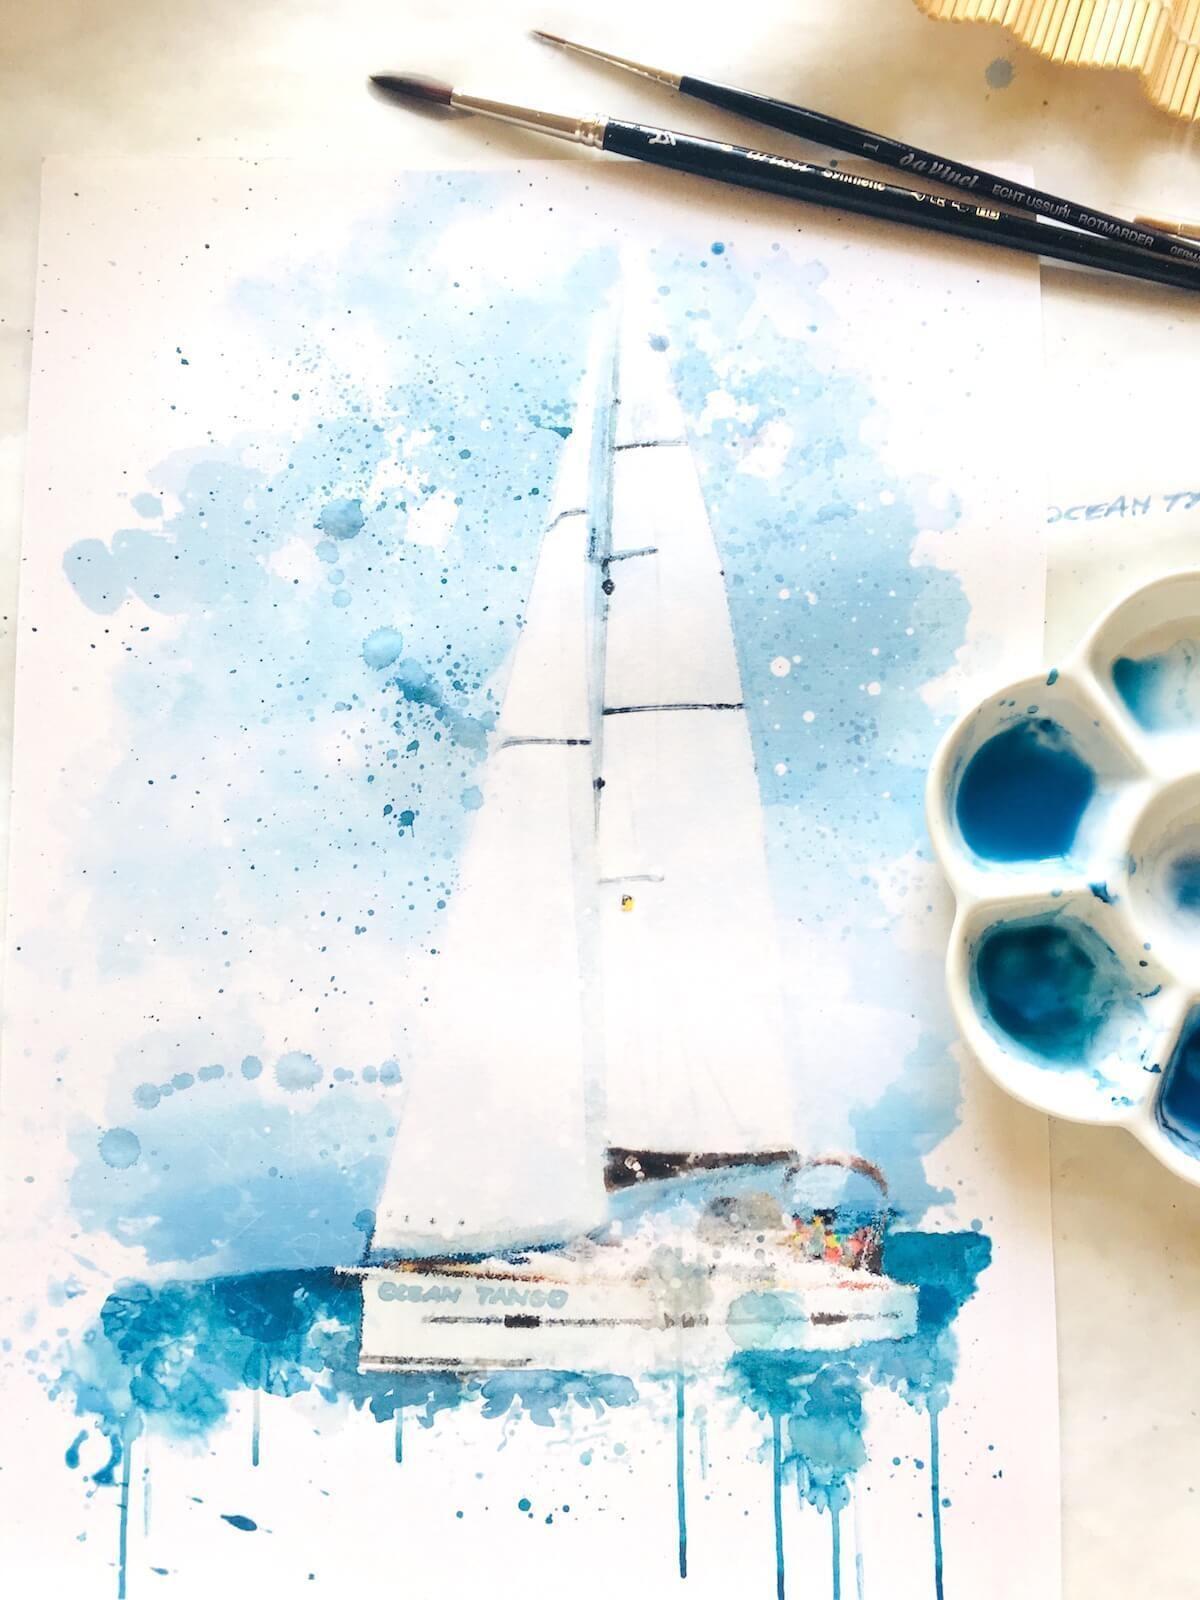 Aquarell Segelboot Unter Blauem Himmel Aquarell Segelboot